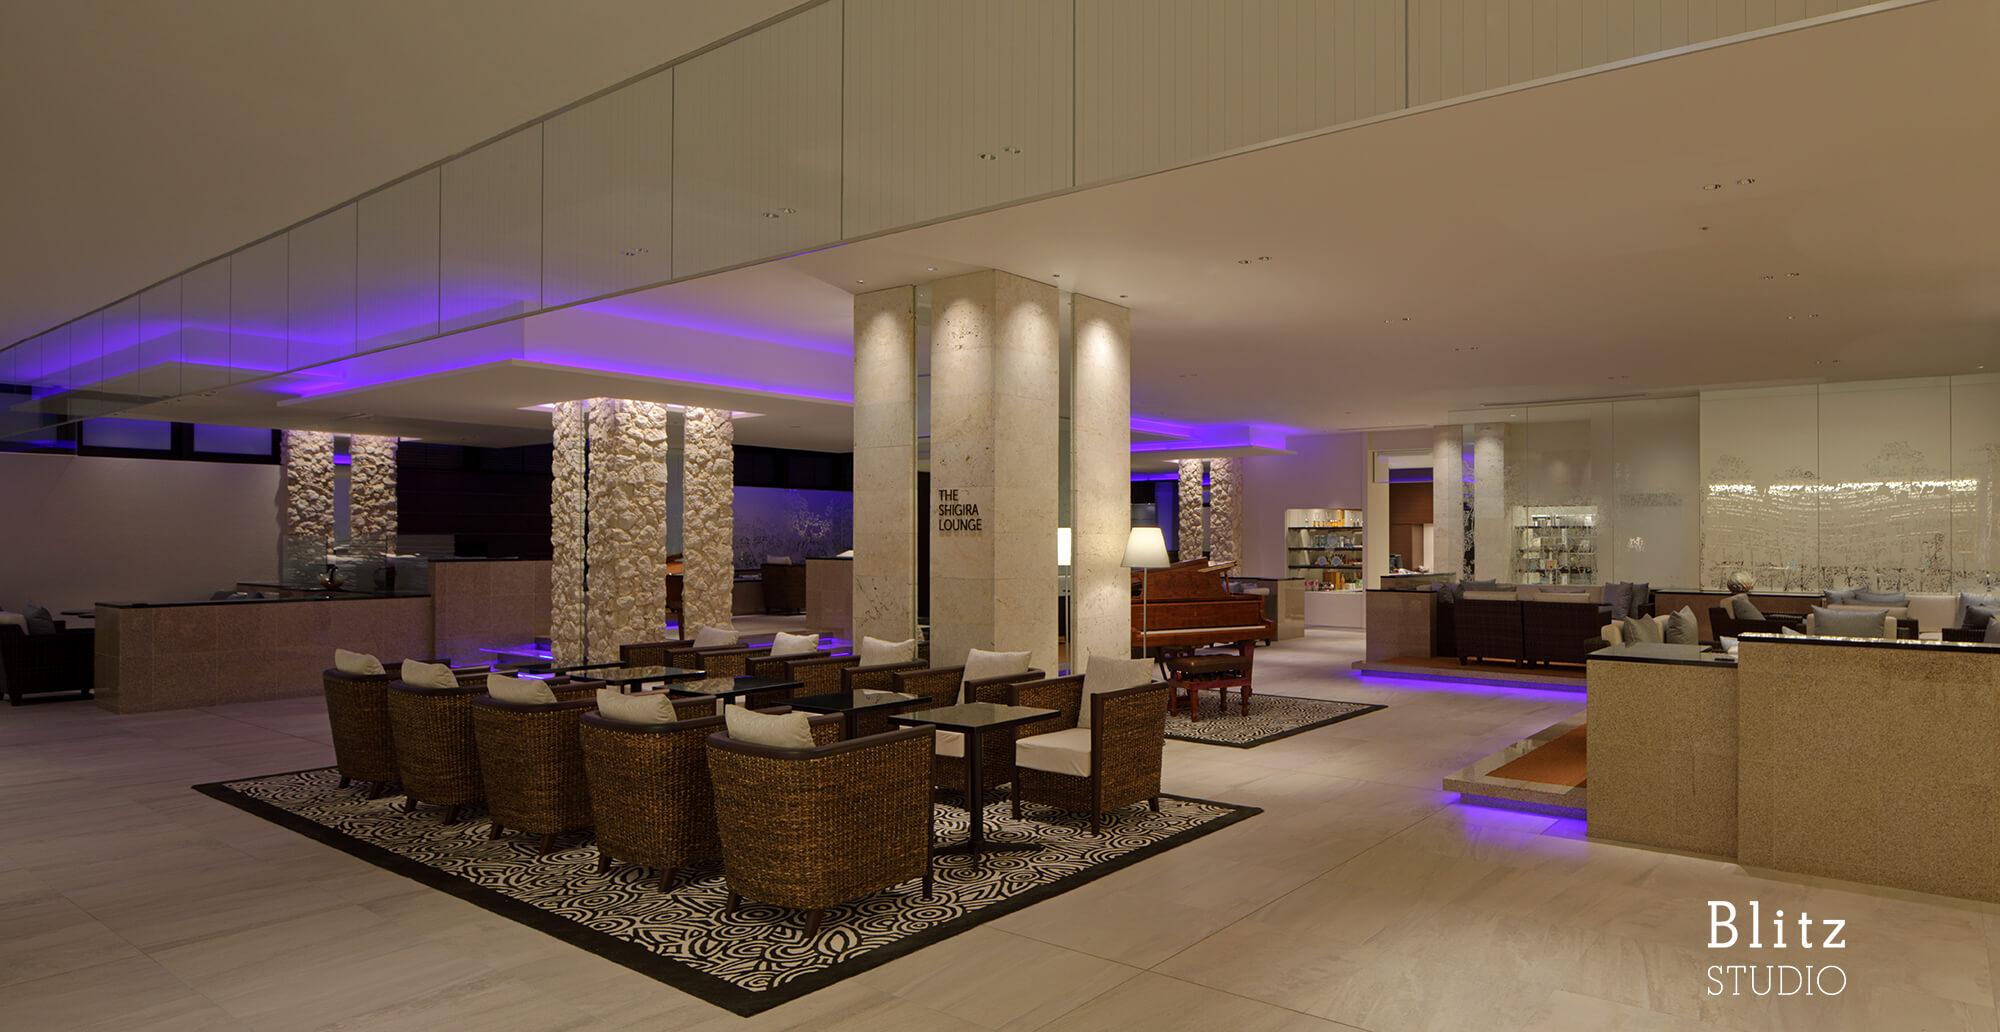 『HOTEL SHIGIRA MIRAGE BAYSIDE』建築写真・竣工写真・インテリア写真12